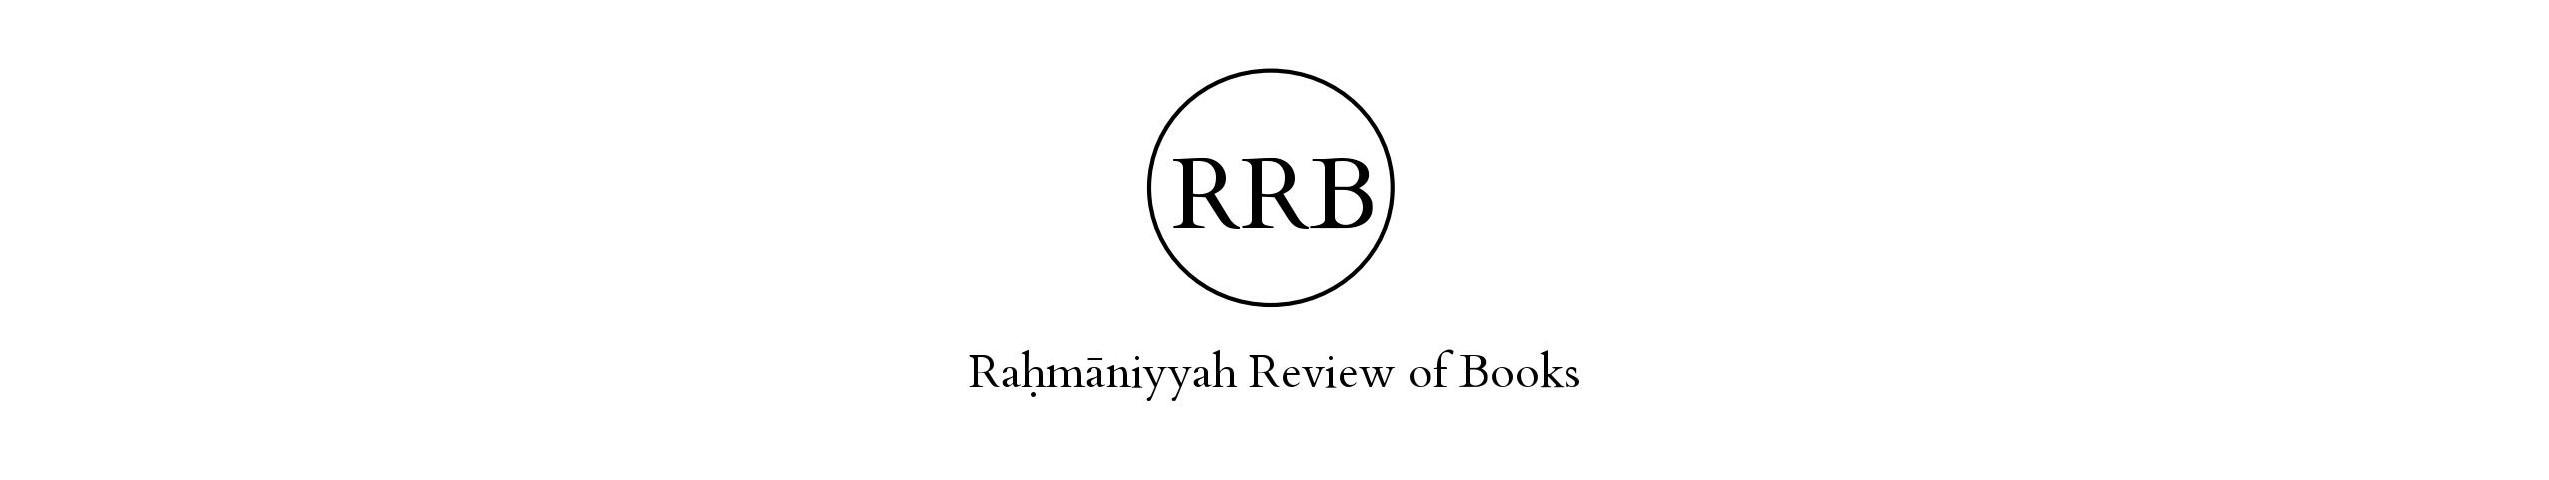 Rahmaniyyah Review of Books